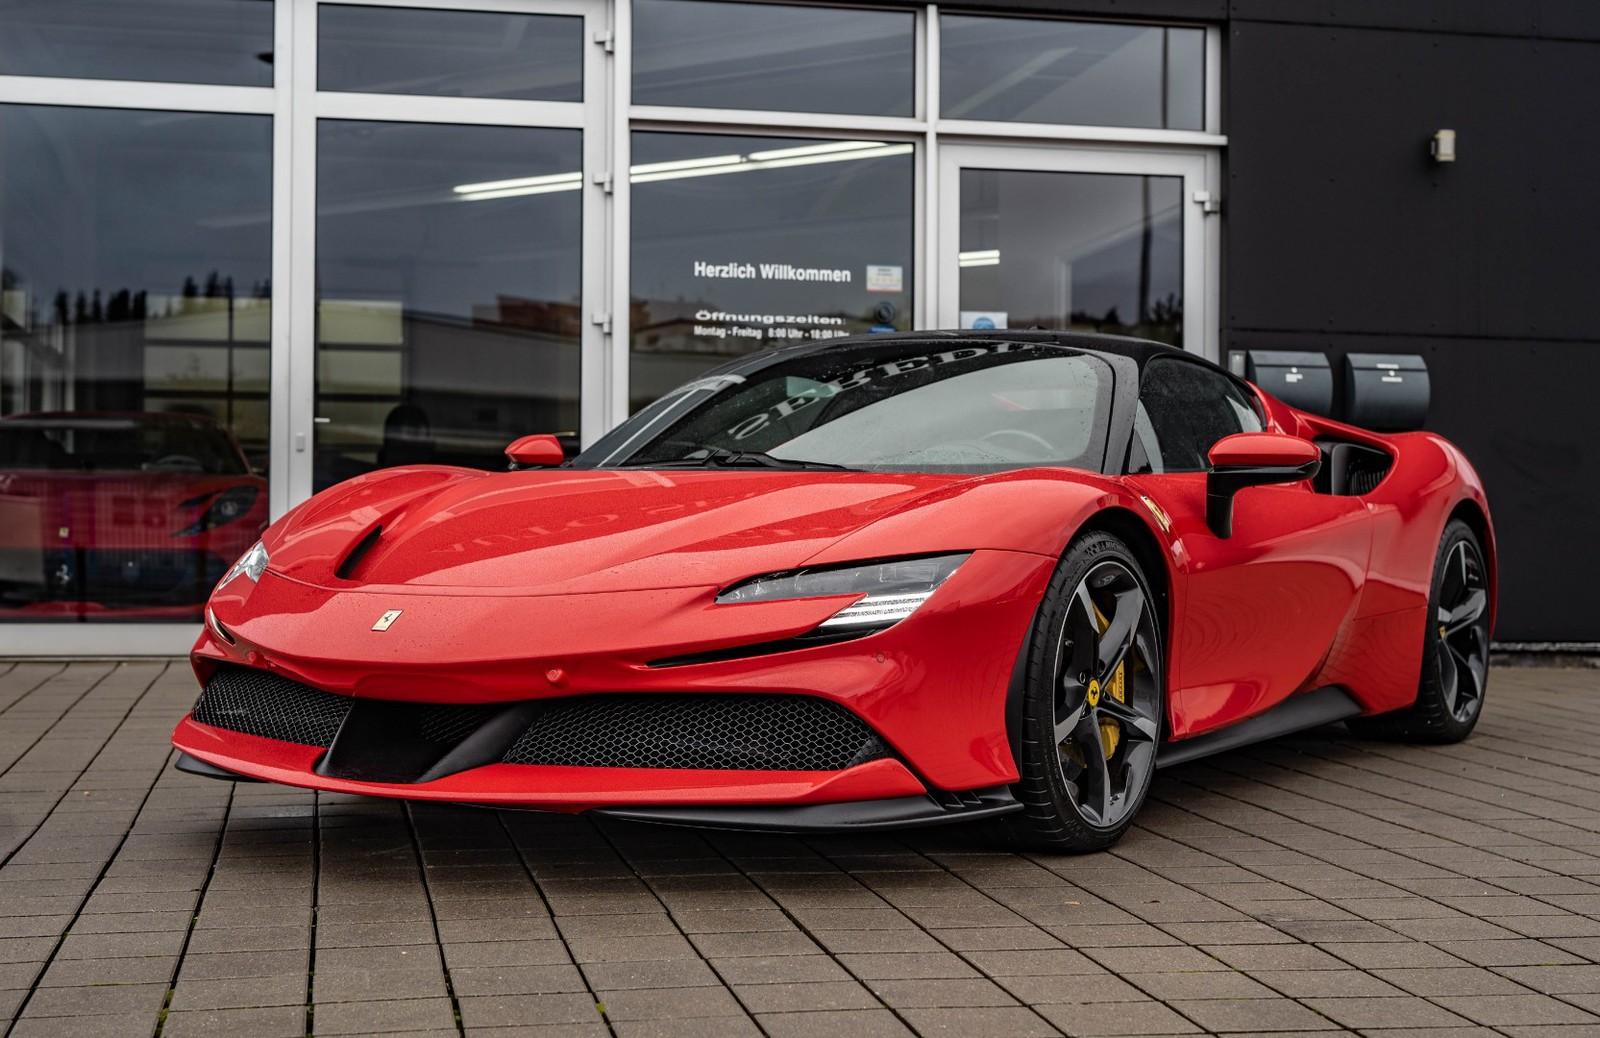 Ferrari Sf90 Stradale Neu Kaufen In Hechingen Bei Stuttgart Preis 765600 Eur Int Nr 20 589 Verkauft